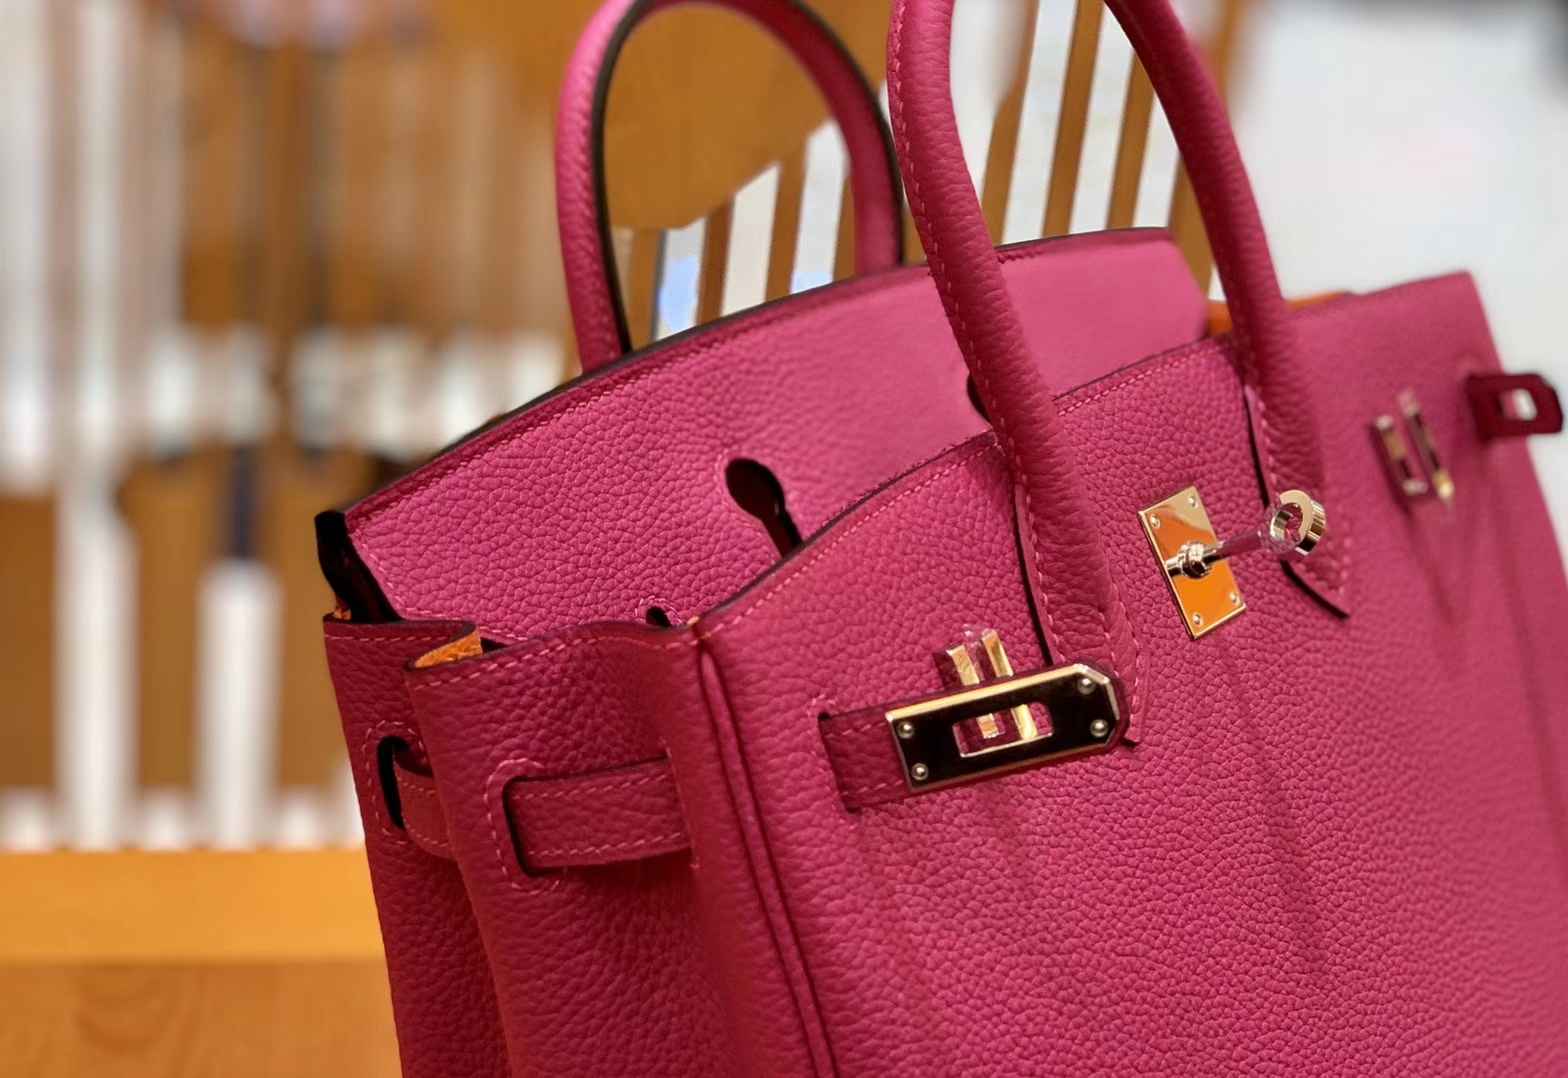 Hermès(爱马仕)Birkin 25cm 拼色 Togo 德国进口小牛皮 全手工缝制